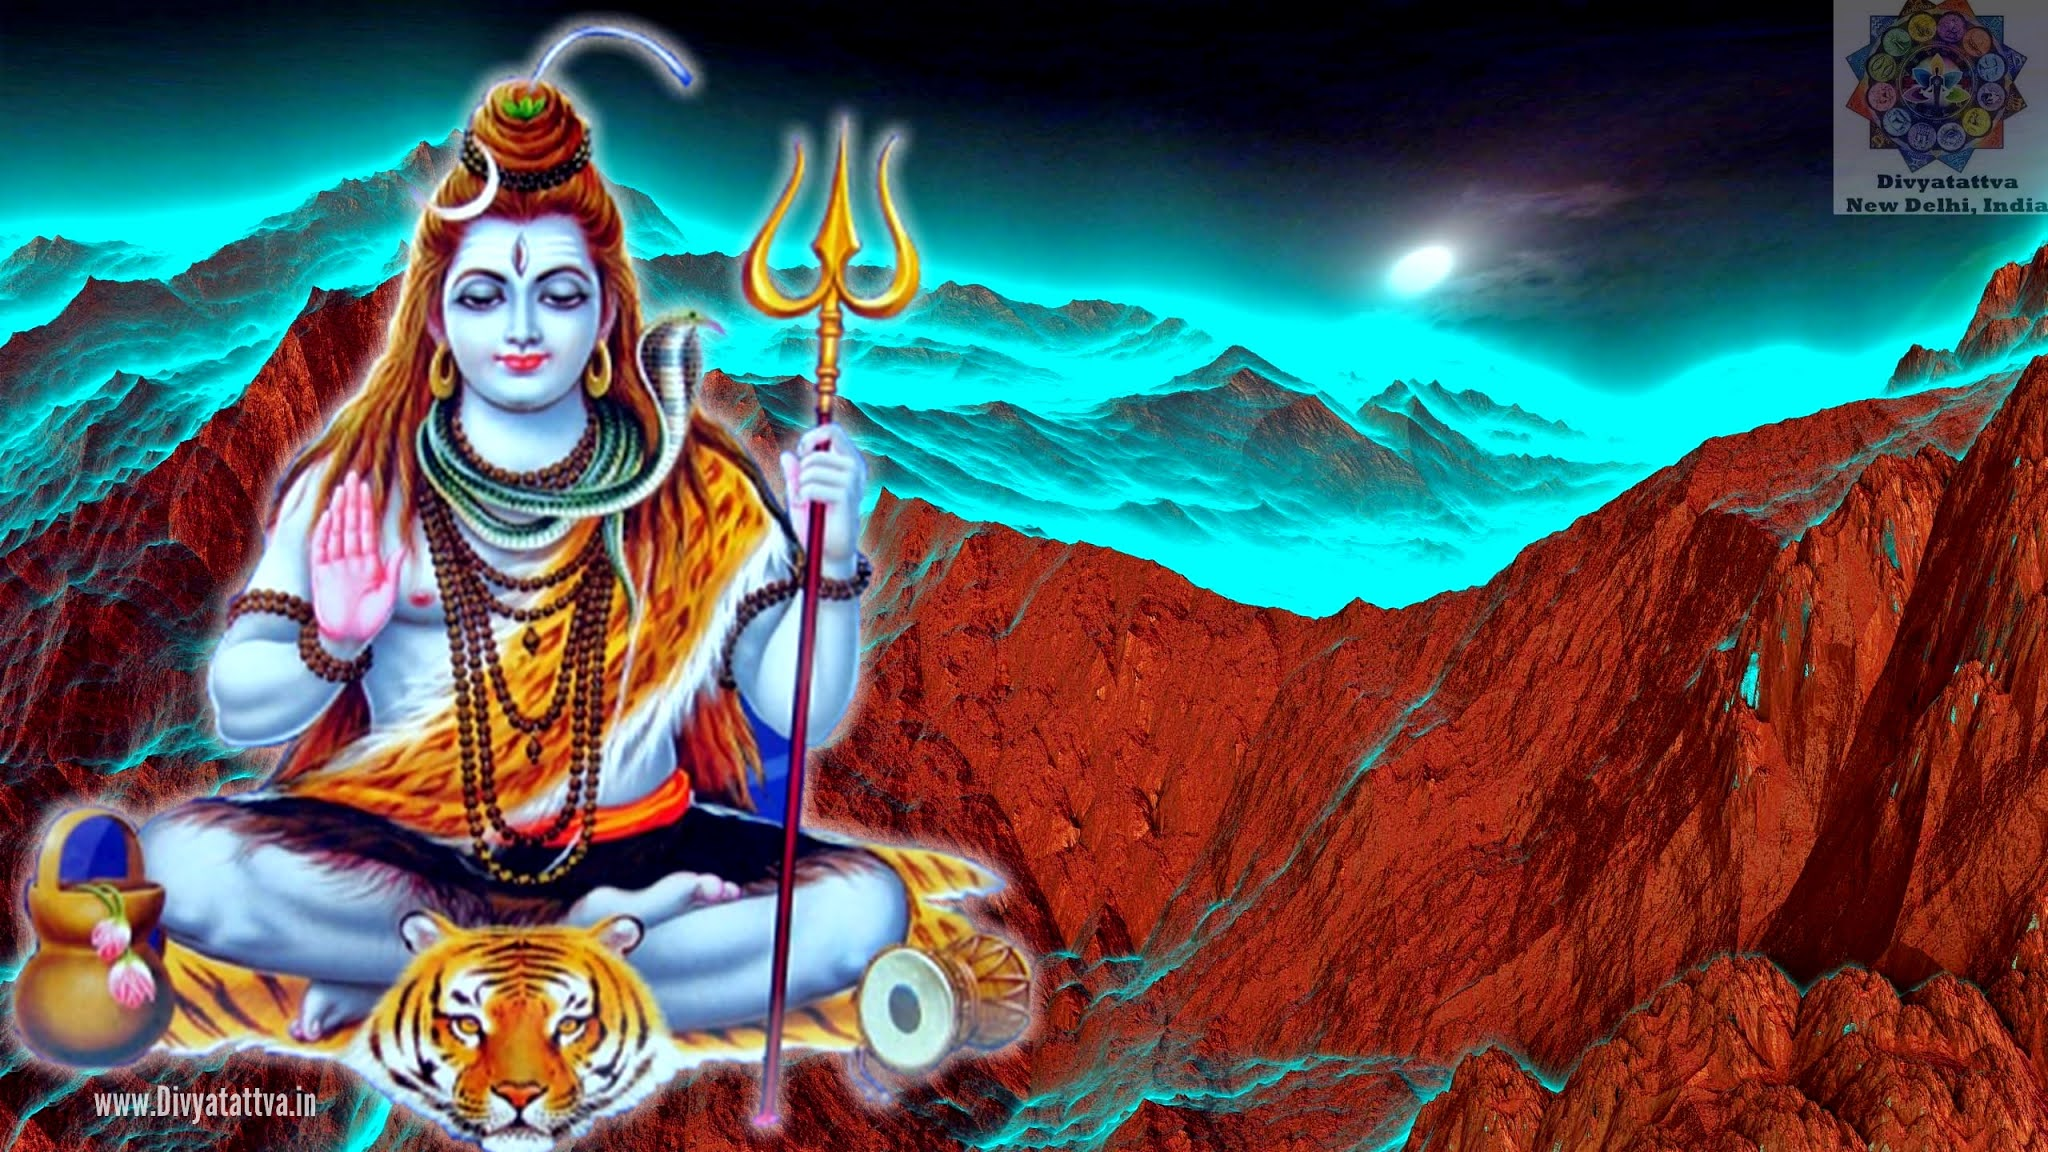 Lord Shiva Maha Shivaratri Meditation Samadhi Wallpapers Images & Photos